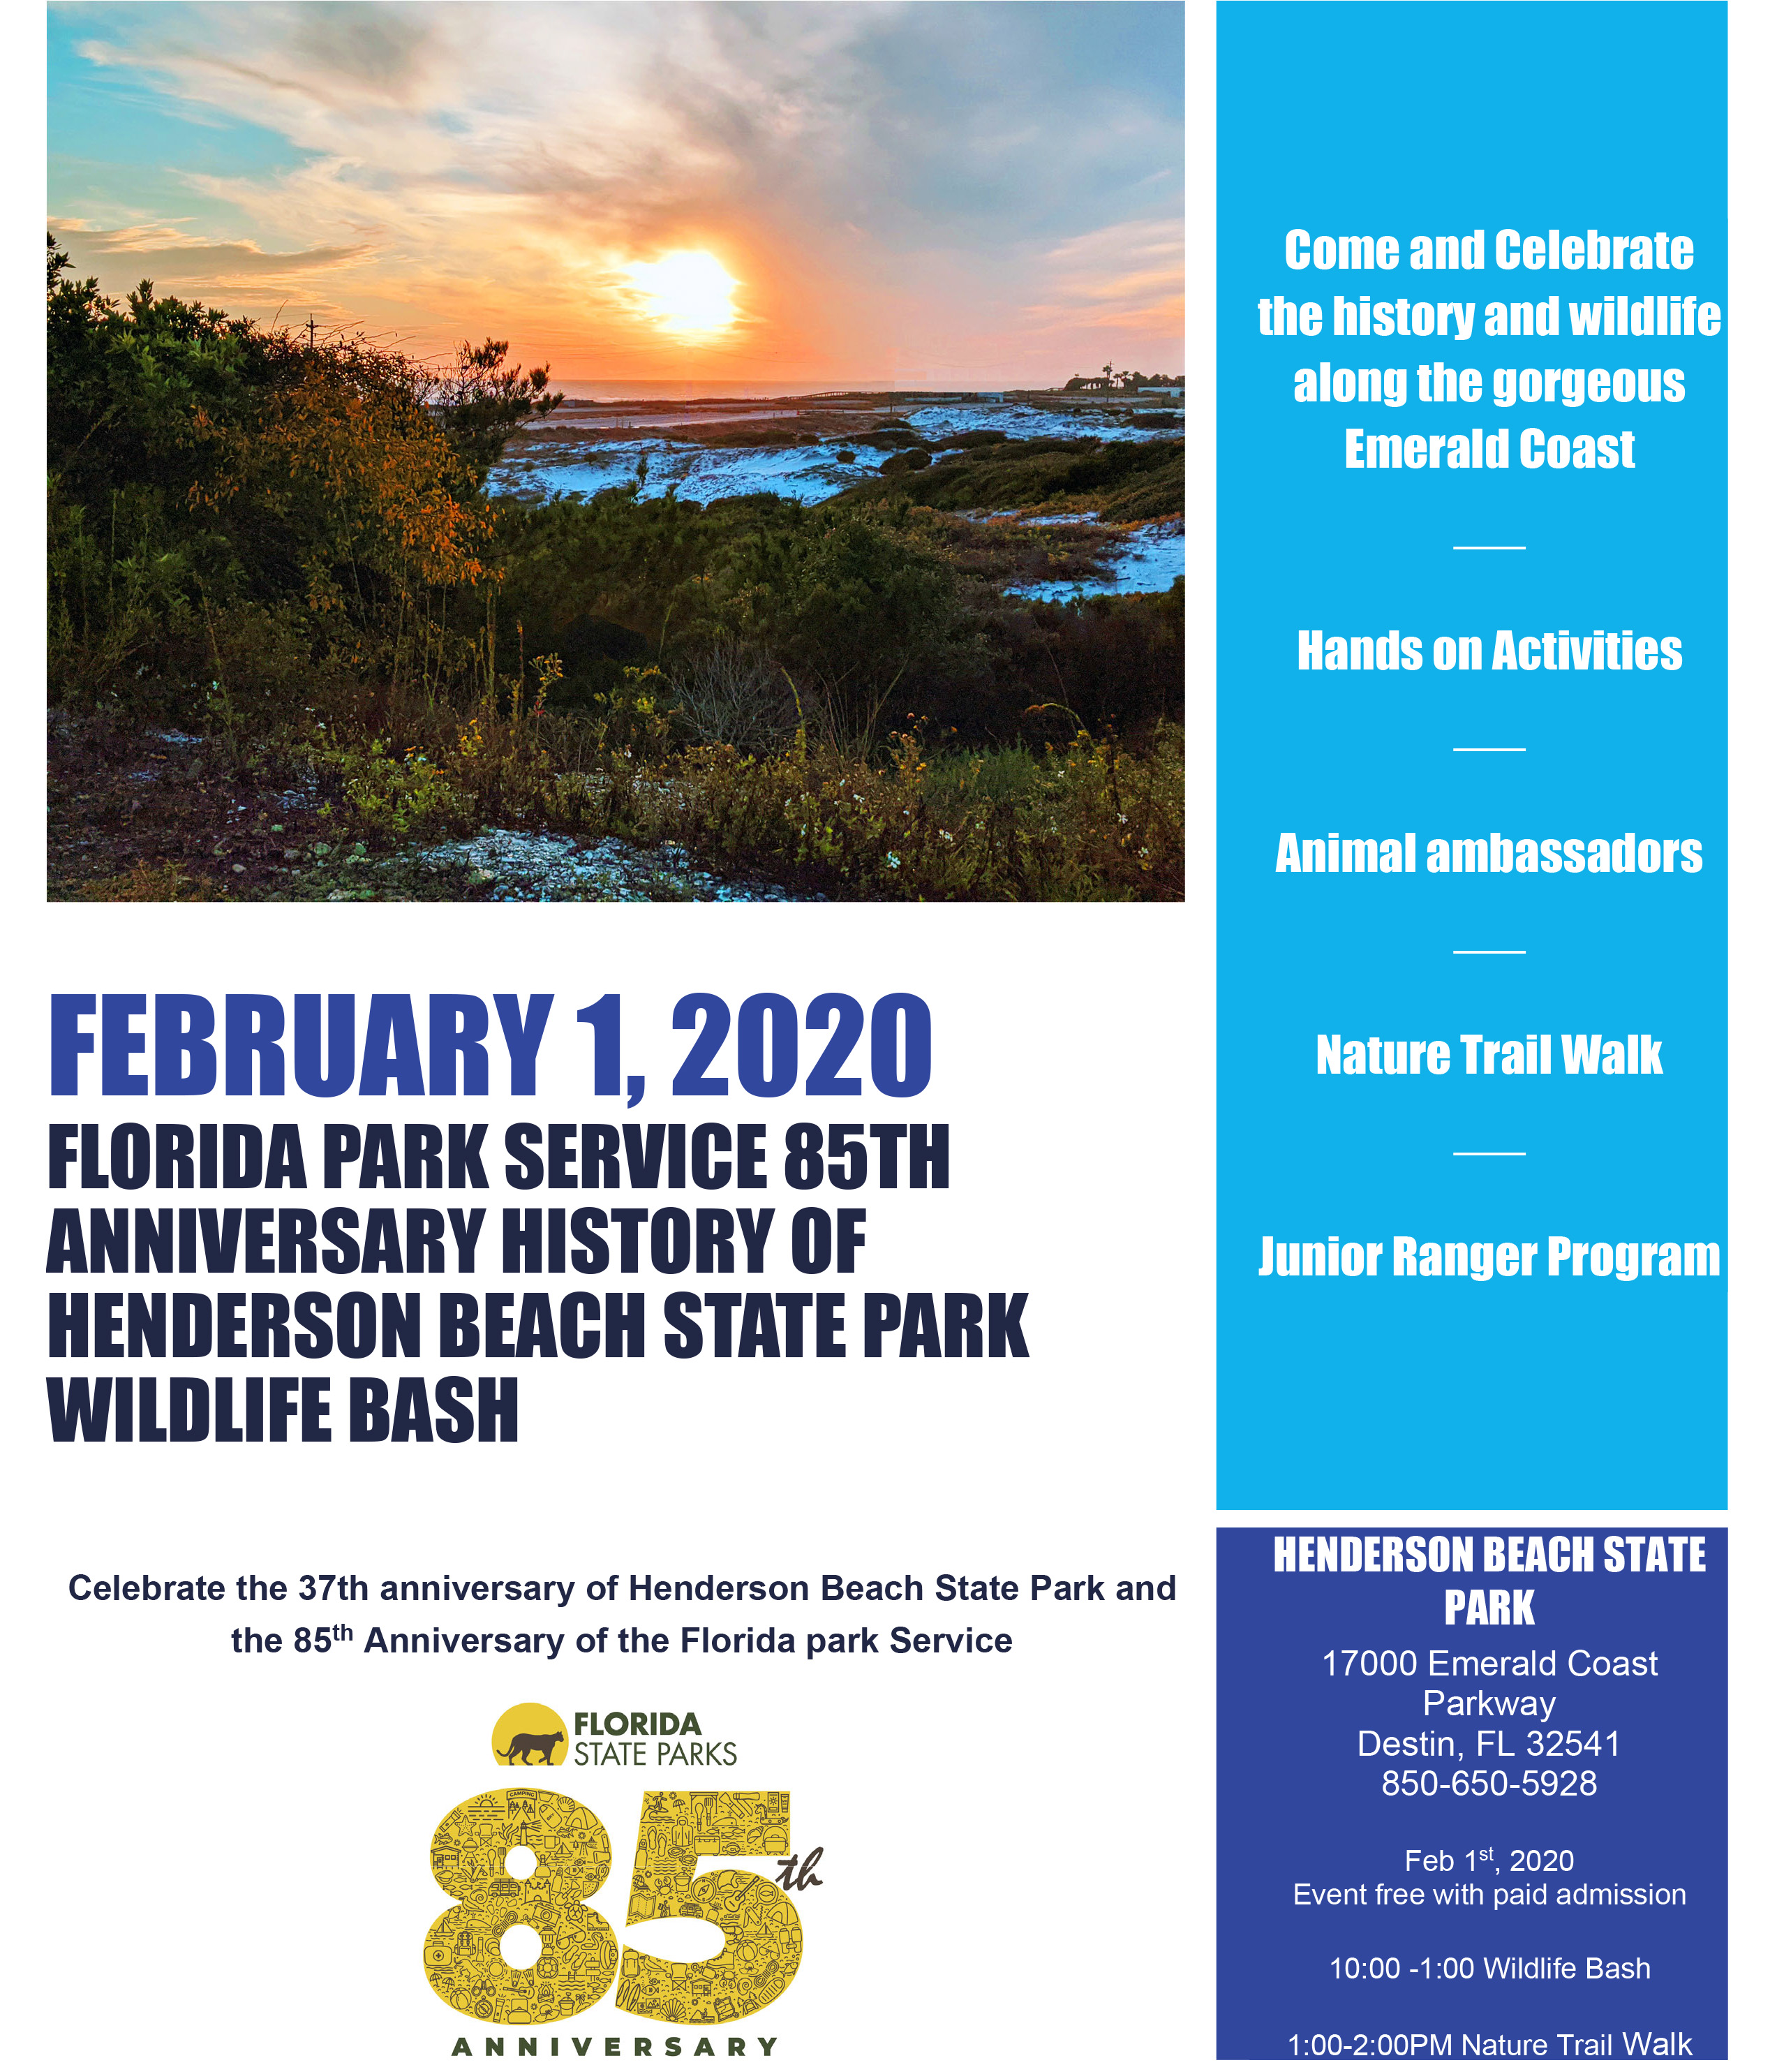 Henderson Beach State Park 85th Anniversary